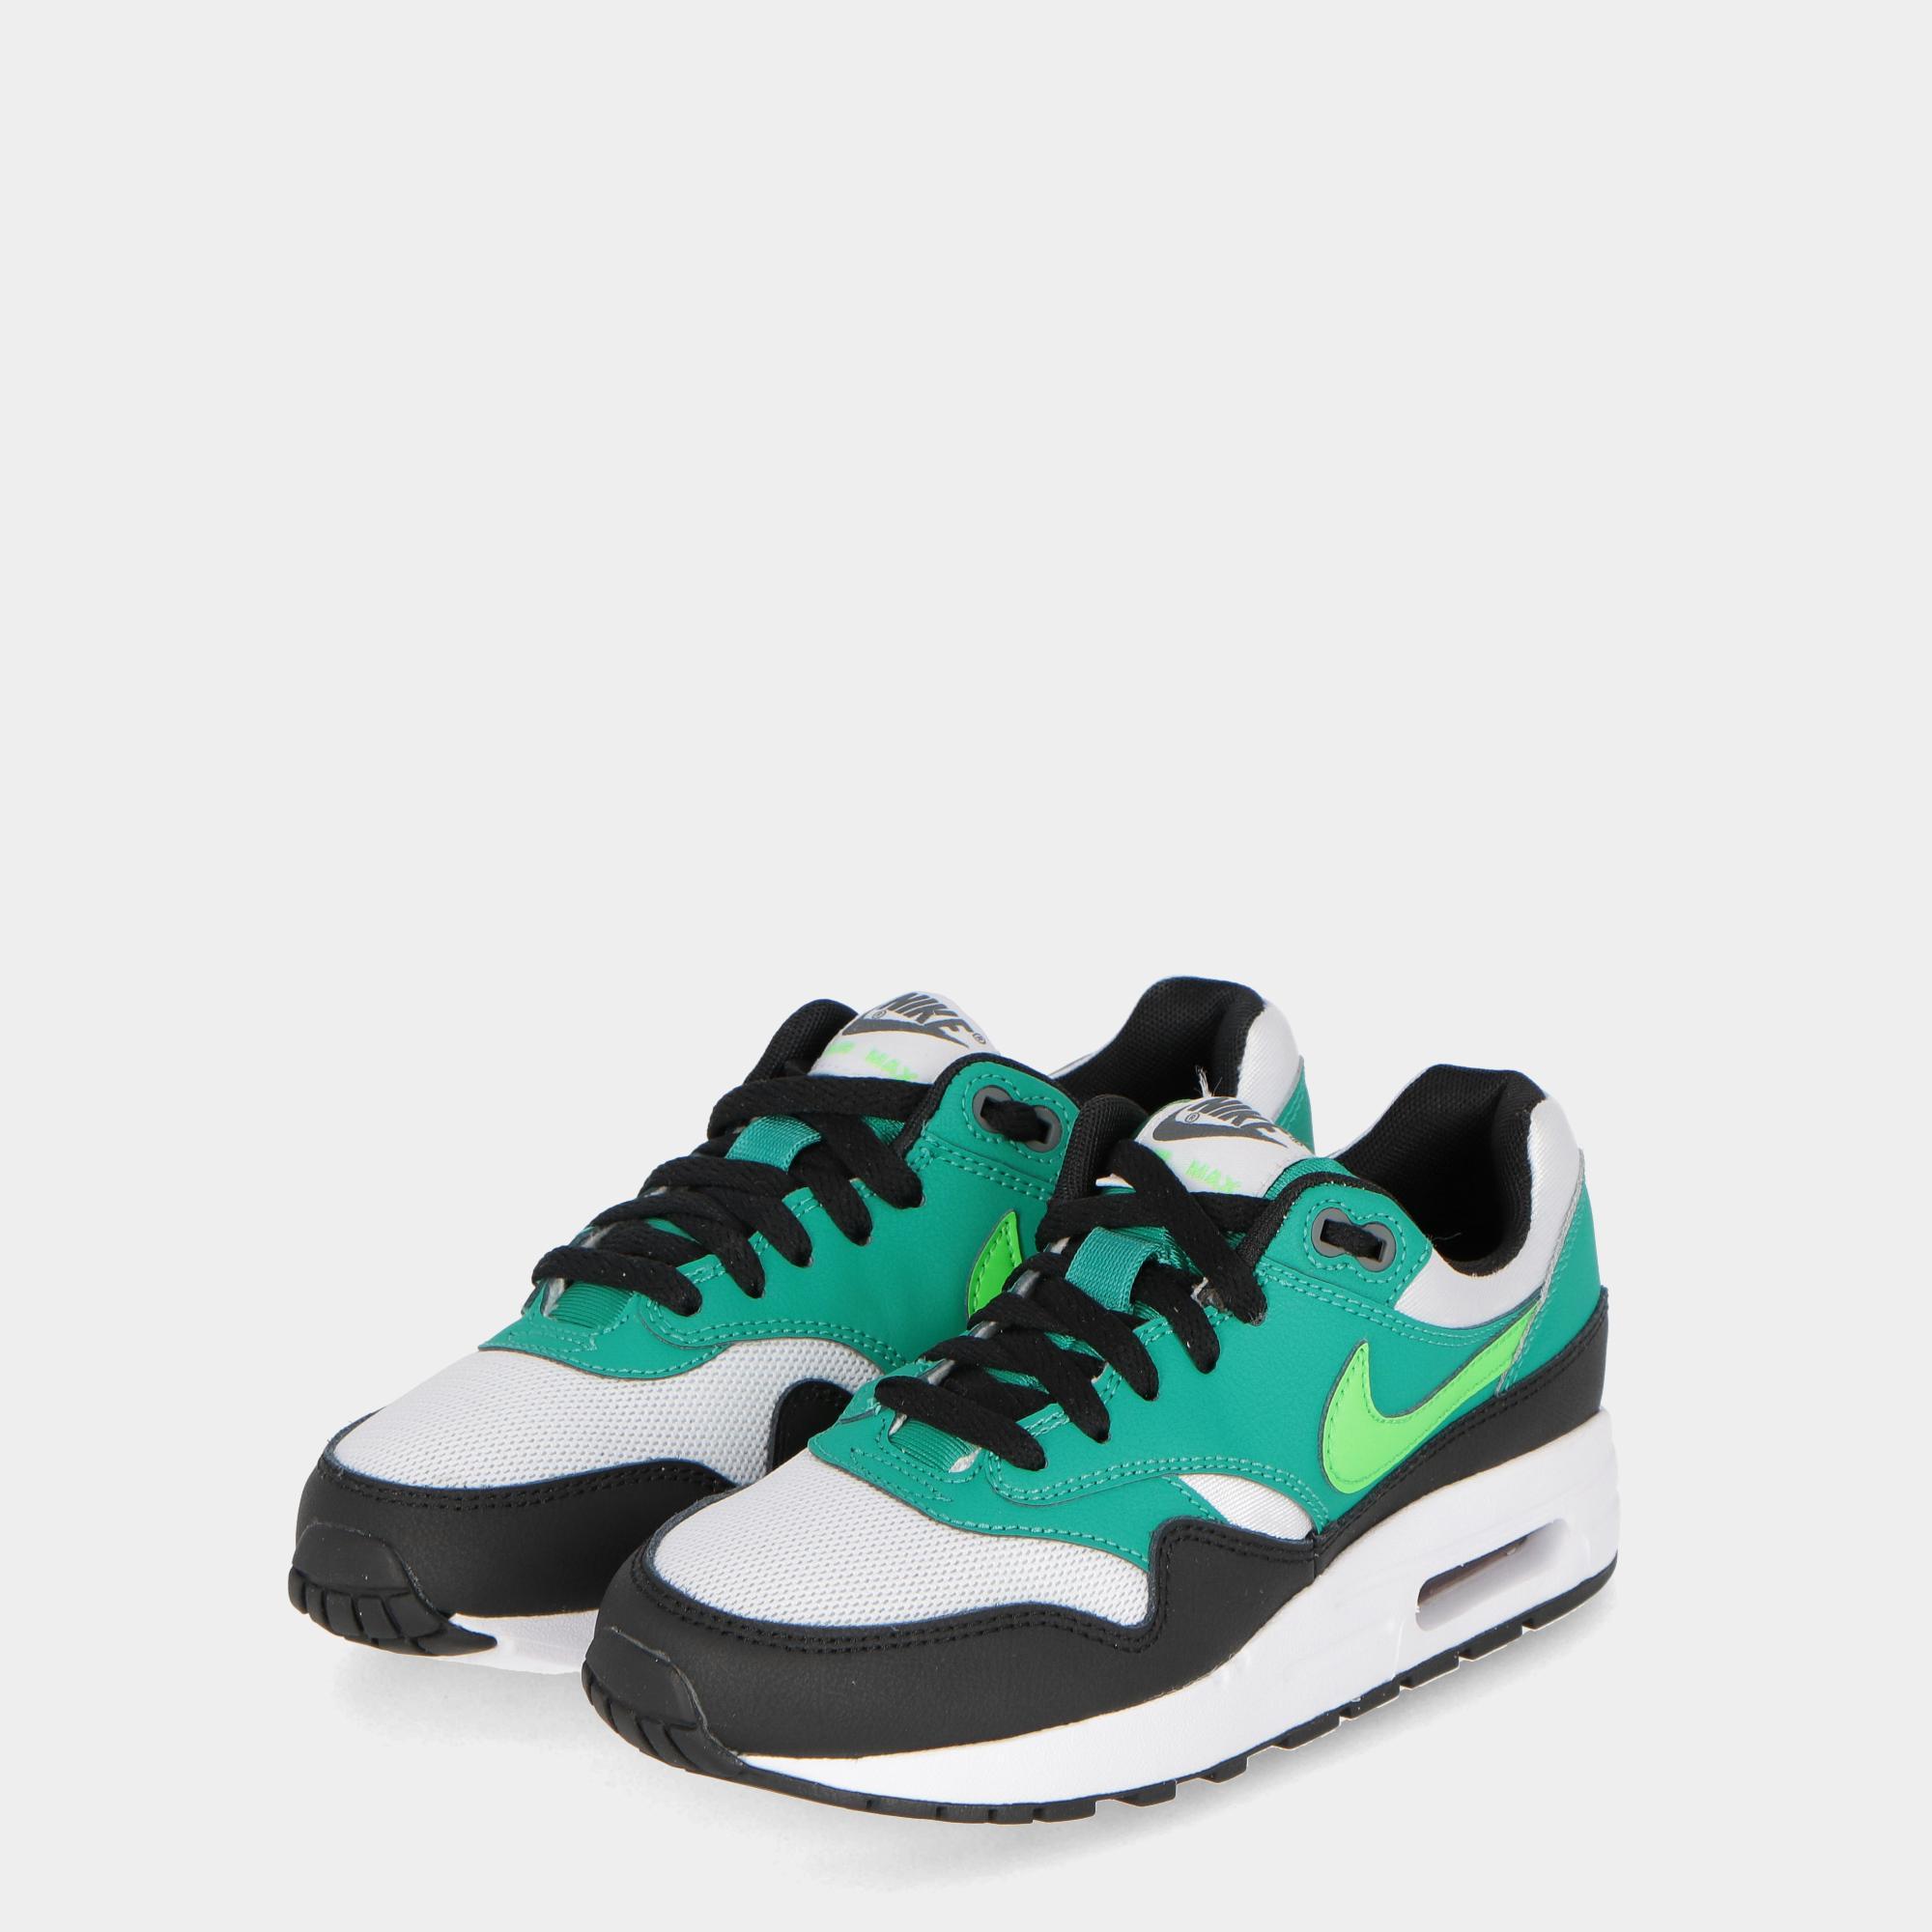 buy popular 175c2 f77be Nike Air Max 1 (gs) - Kids Green white